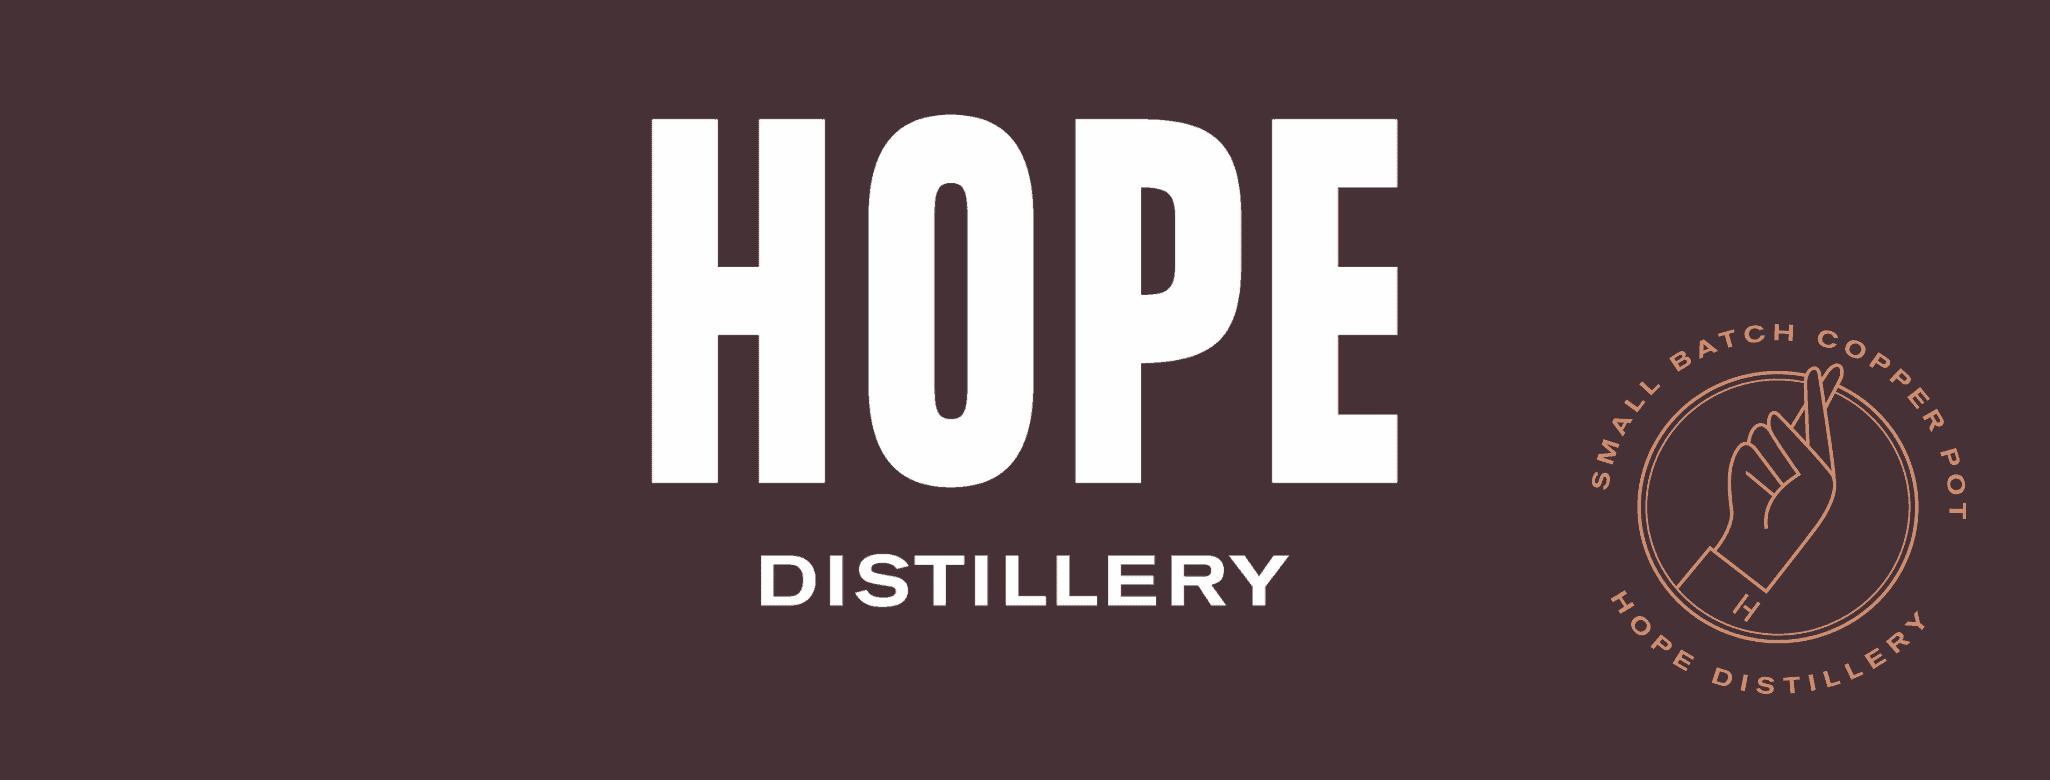 Hope Distellery